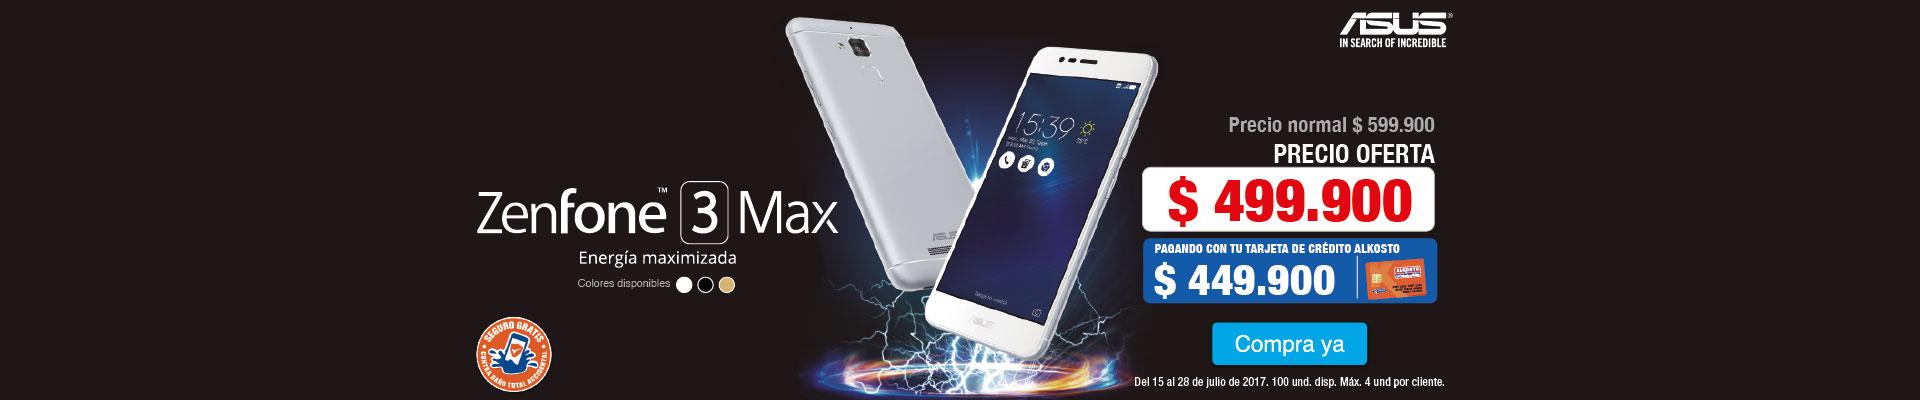 PAUTA PPAL KT-1-celulares-ASUSZenfone3Max-julio-22-25